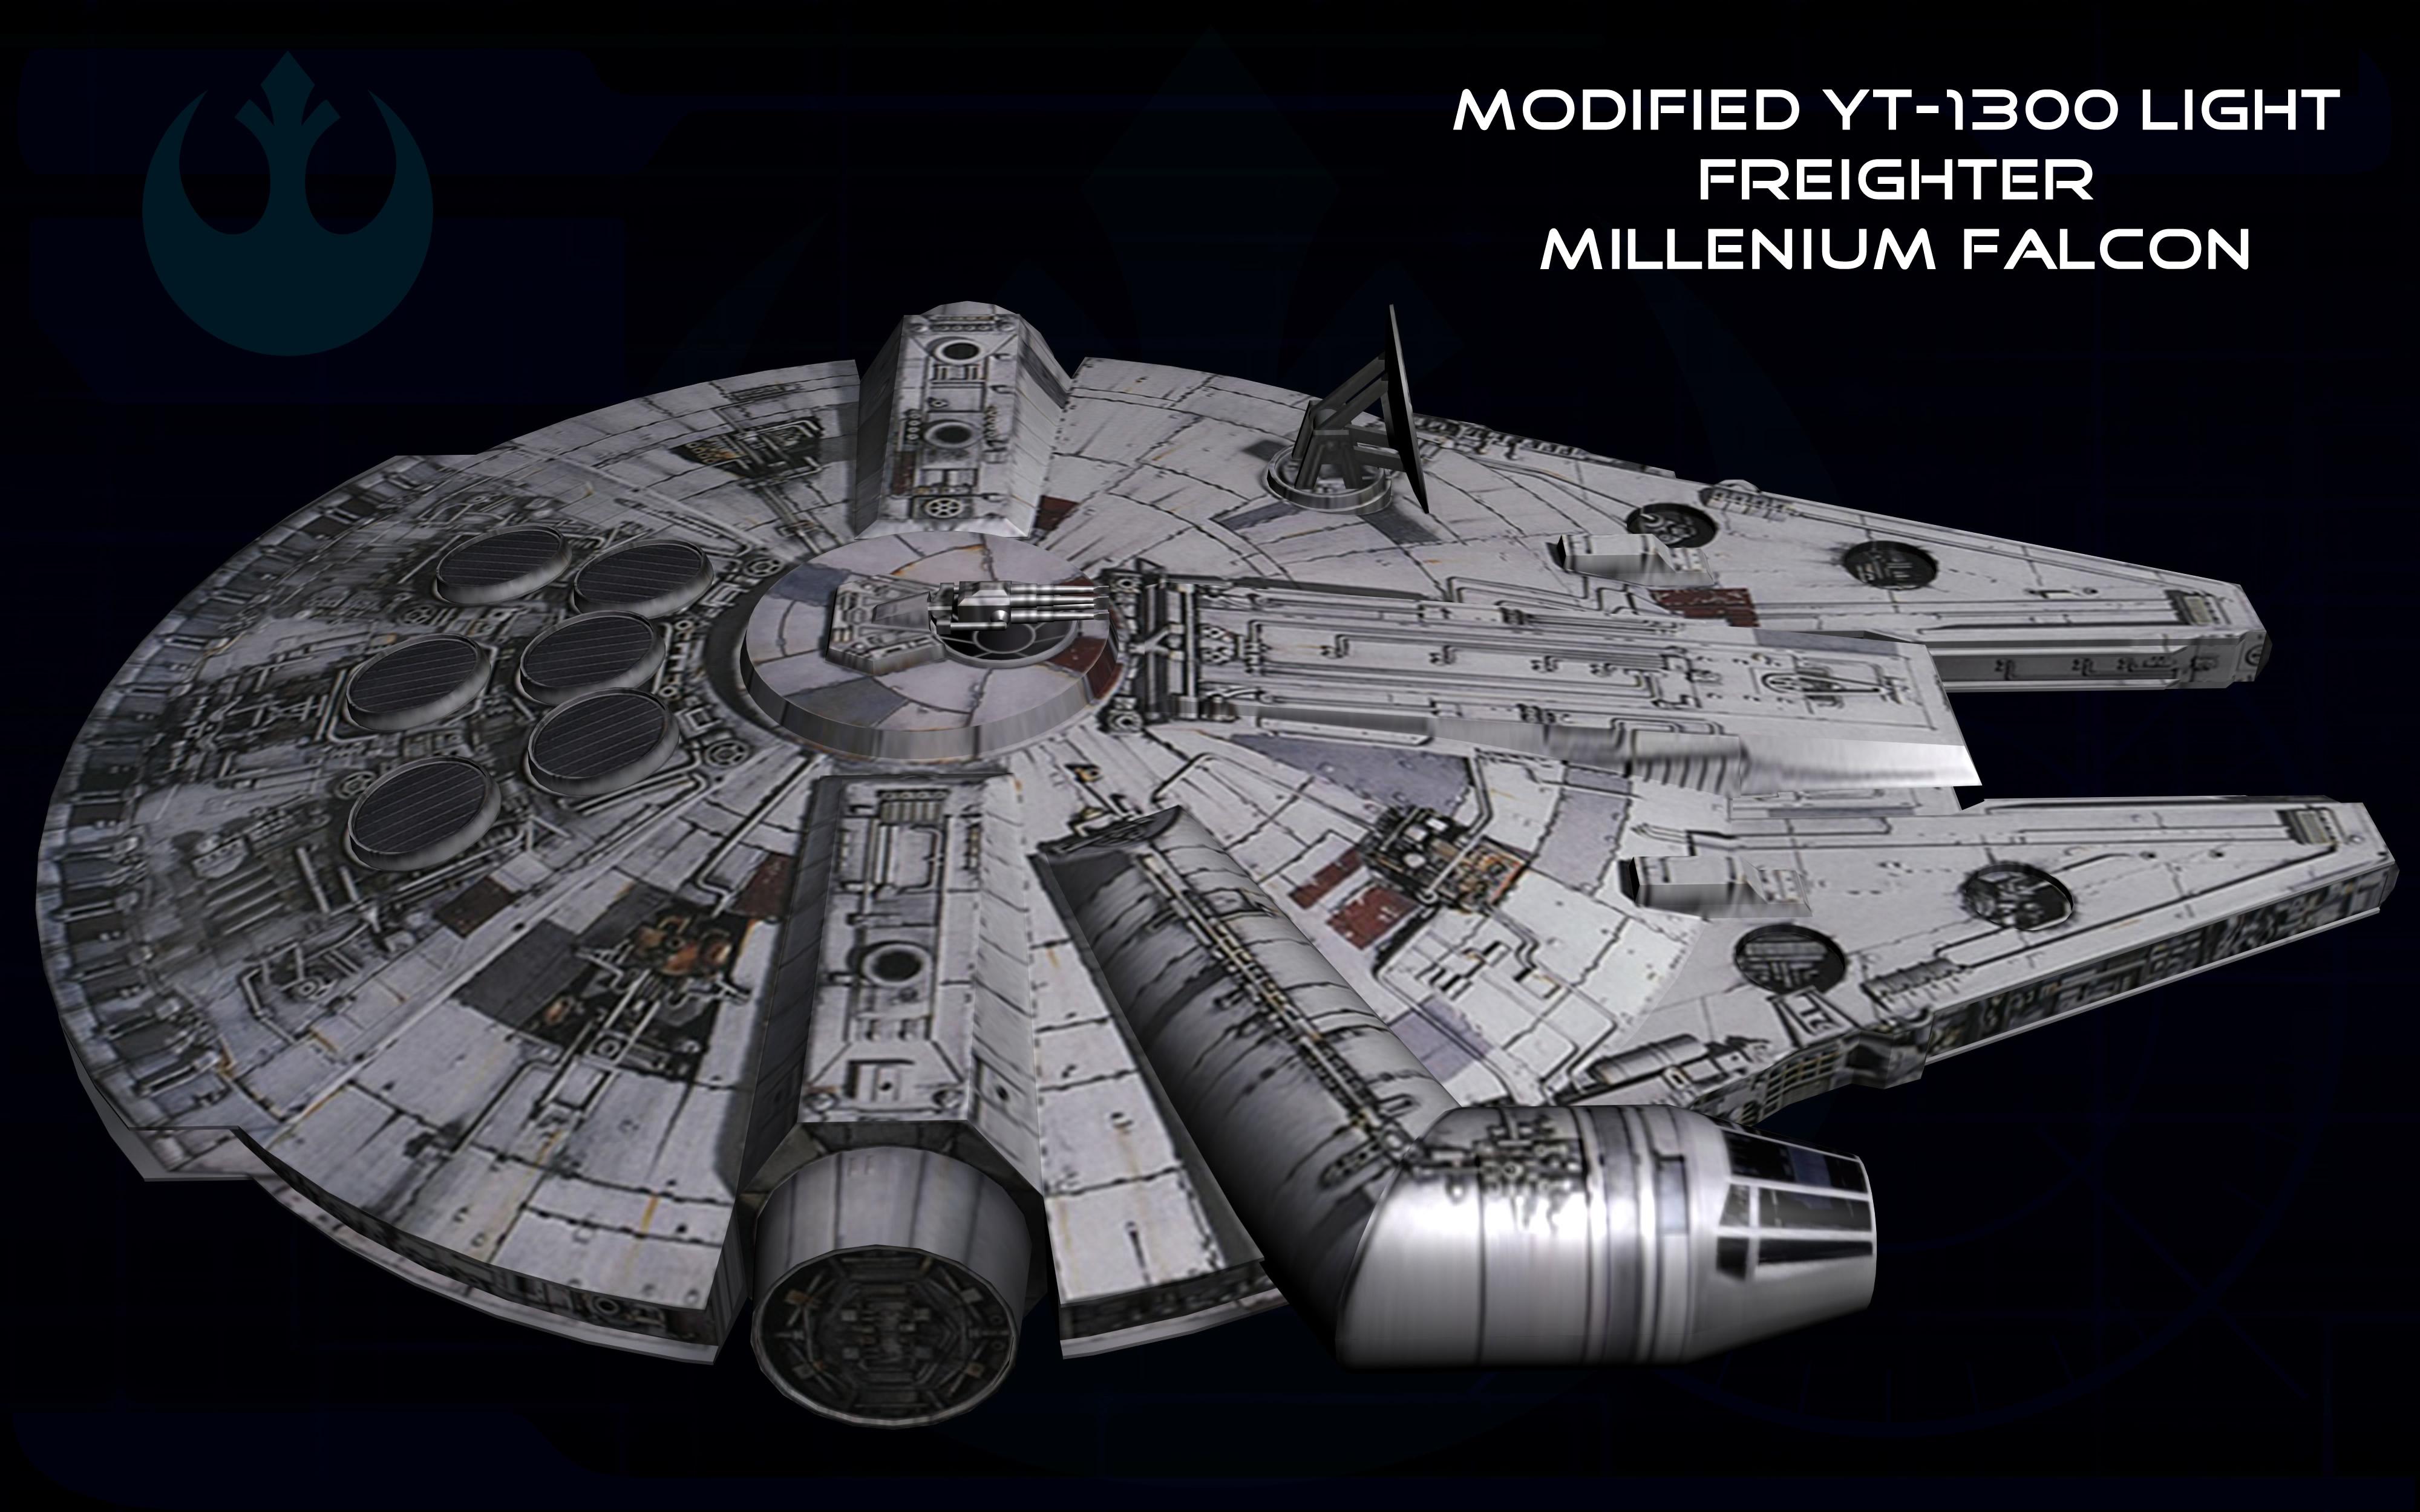 millenium falcon wallpaper